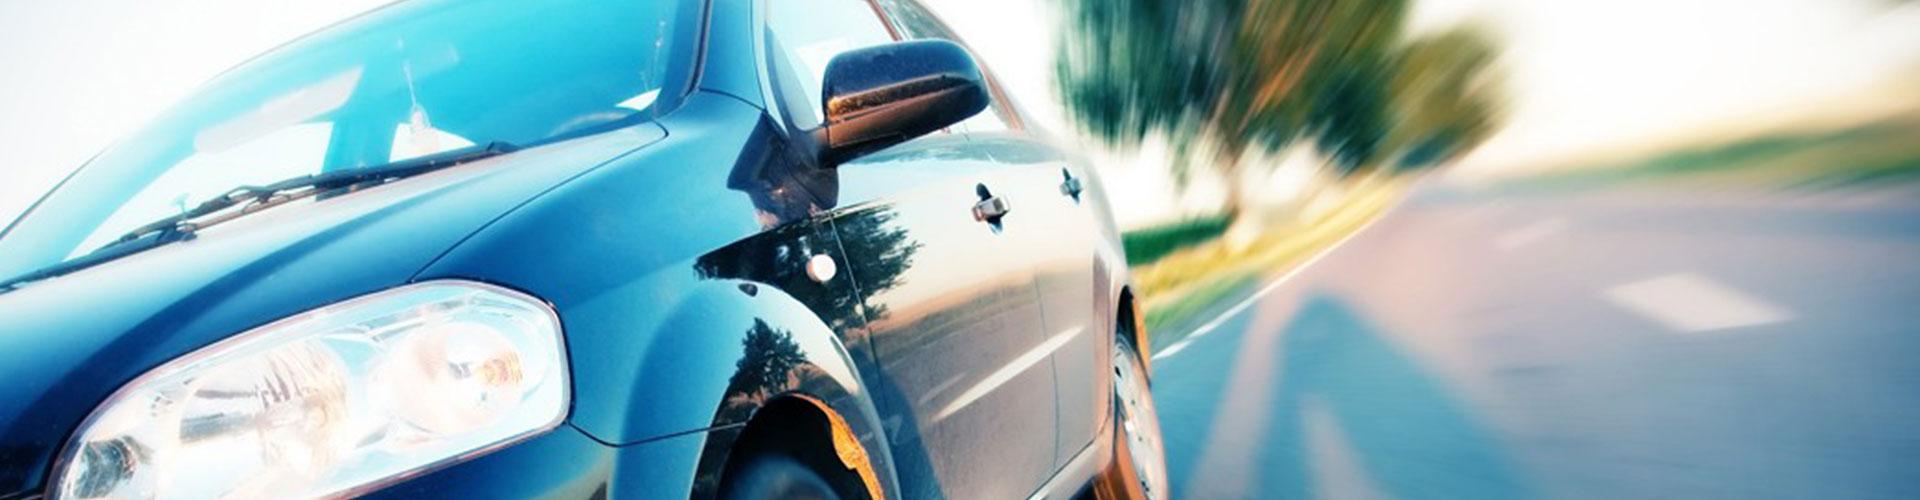 Alfa Auto Insurance >> Auto Auto Rental Motorcycle Insurance Brazil In